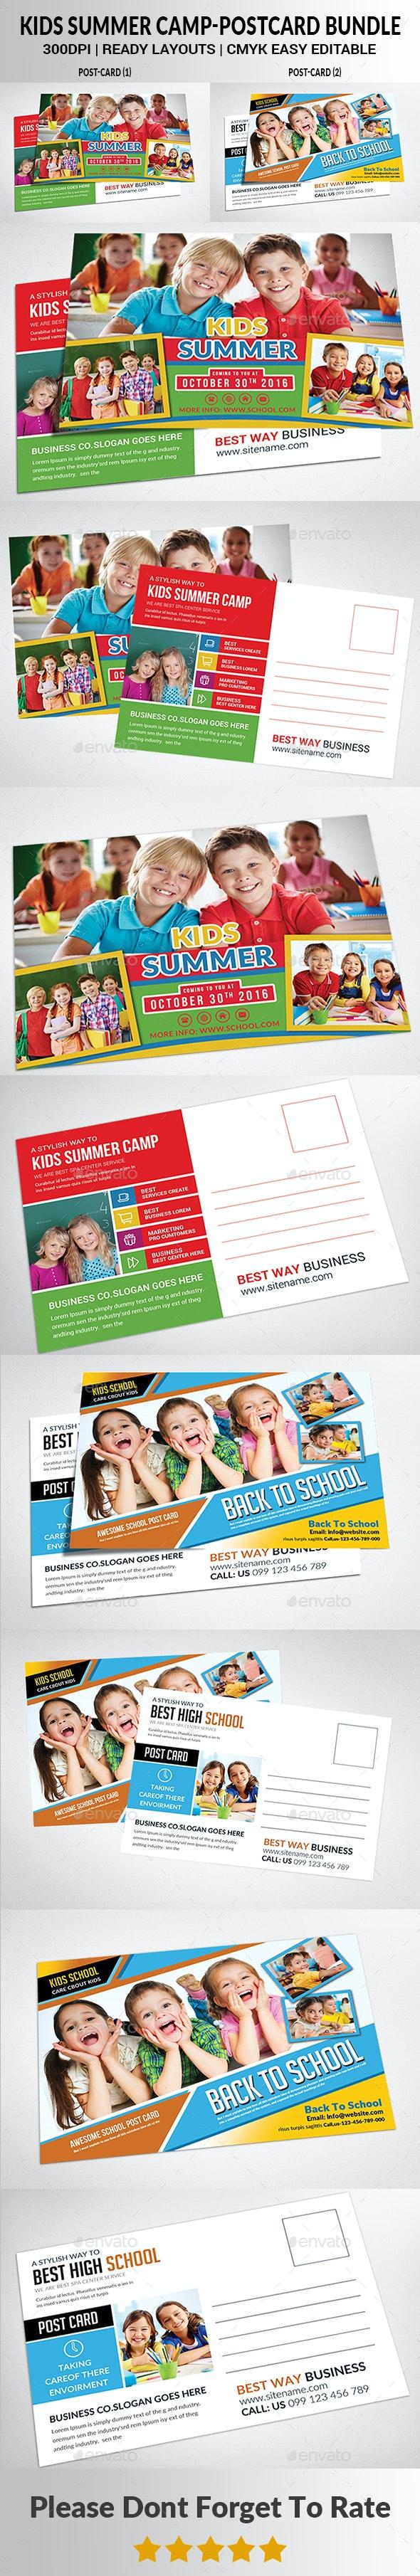 Kids Summer Camp Postcard Bundle - Cards & Invites Print Templates